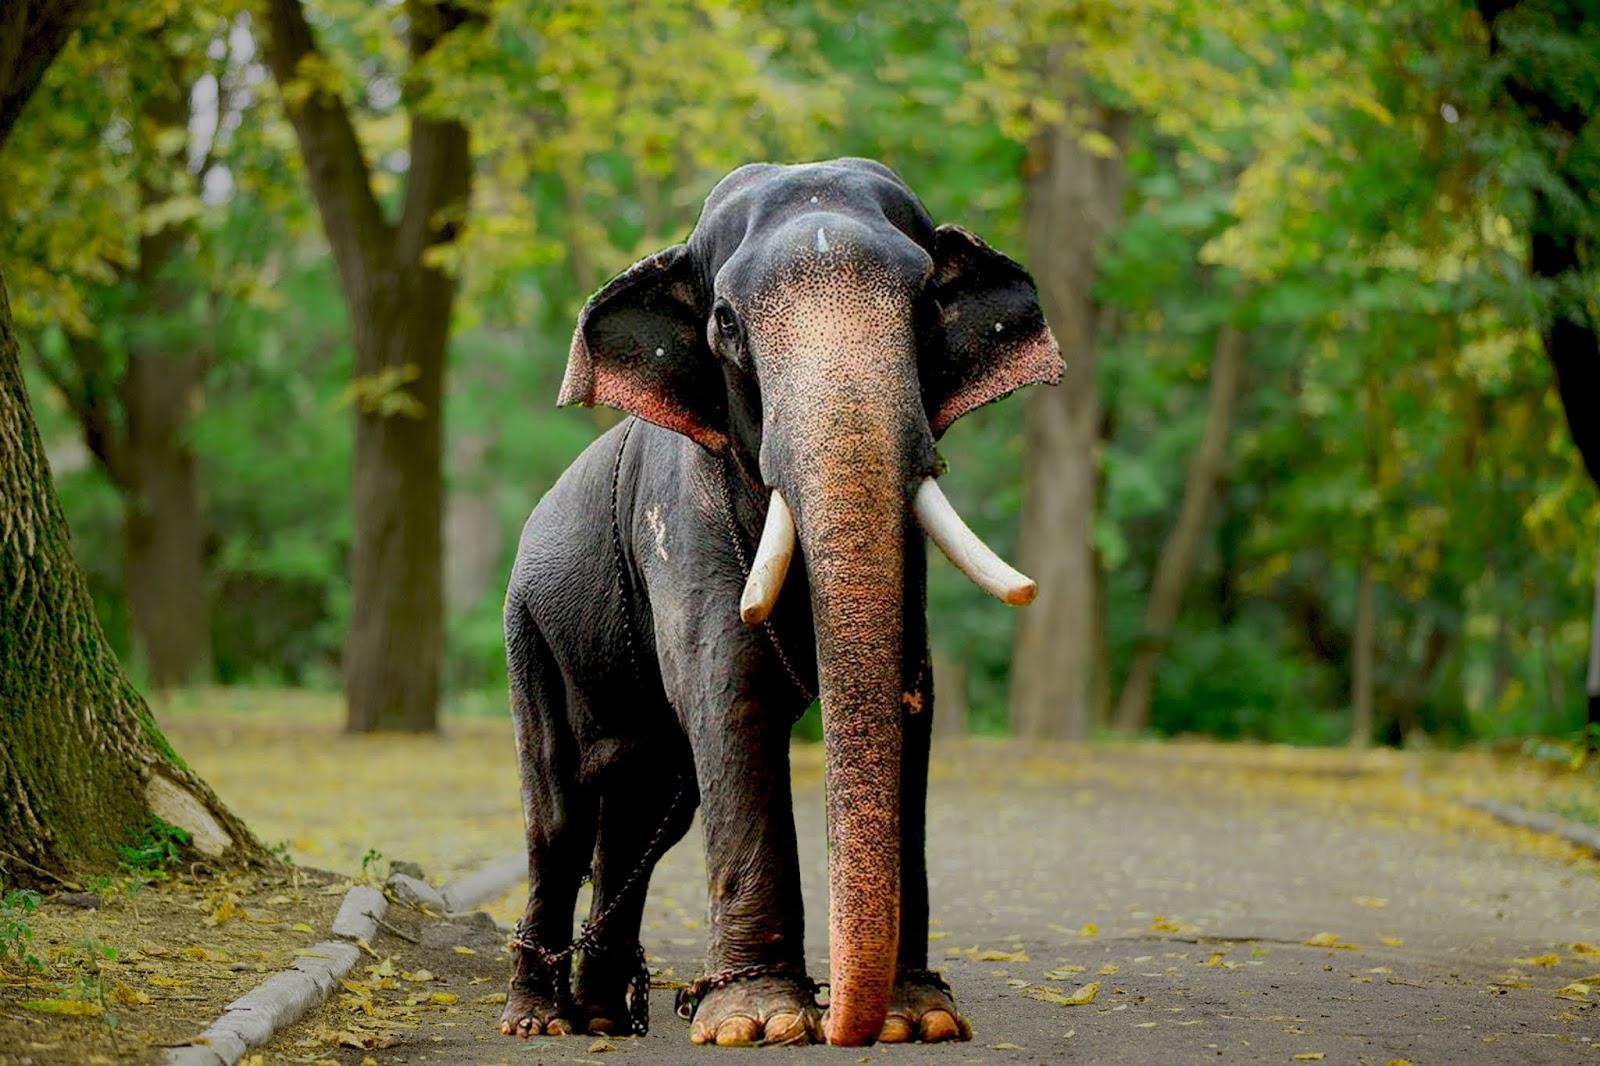 Aanachandam - Kerala Elephants